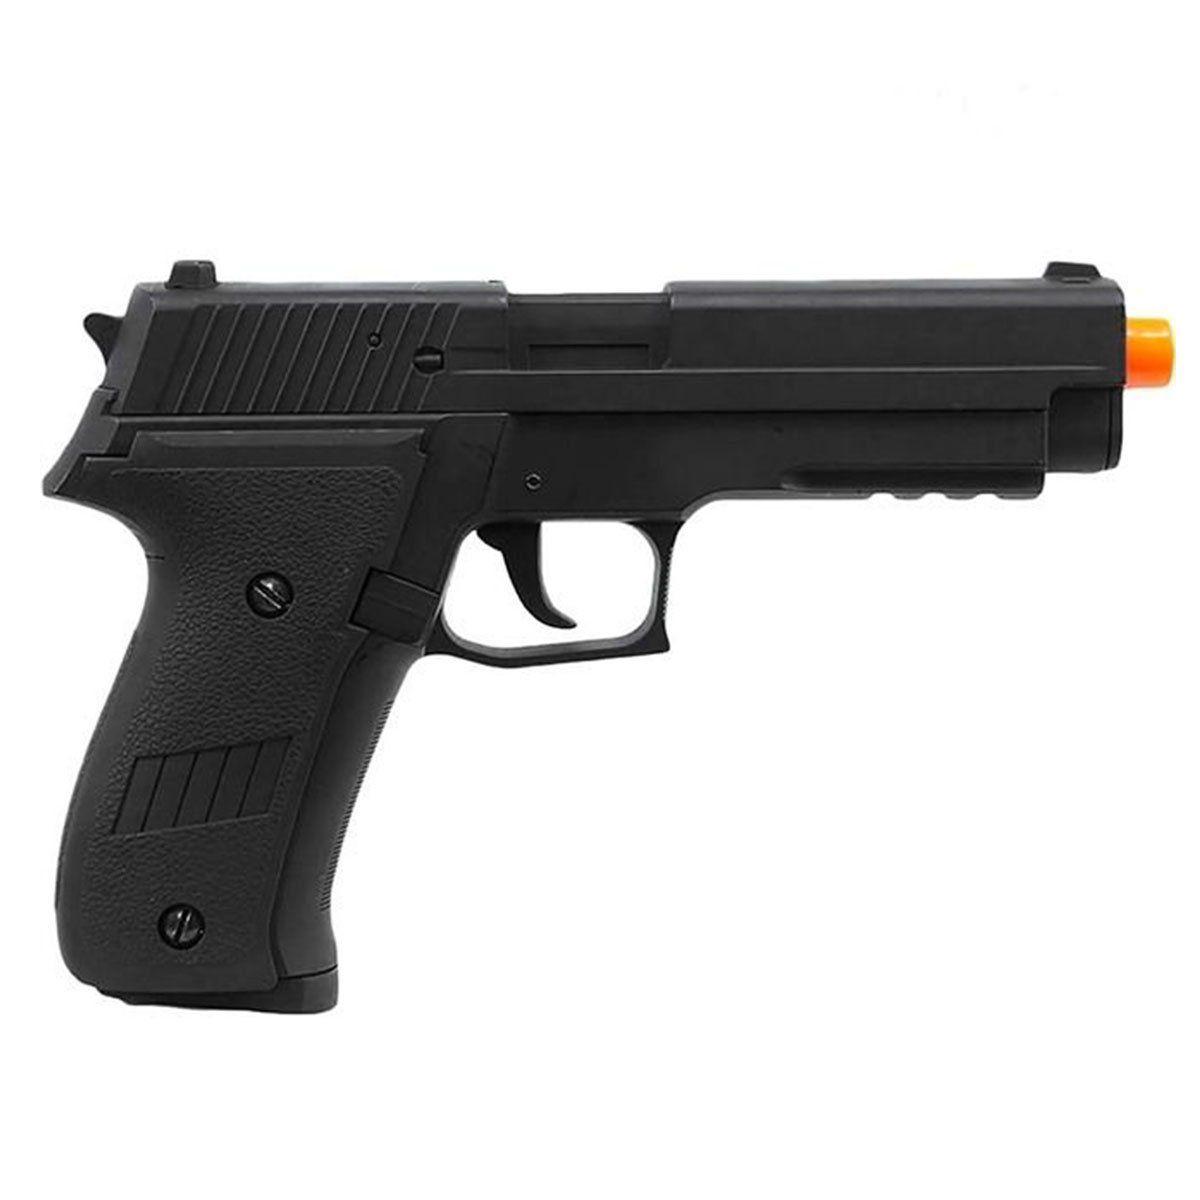 Pistola Airsoft CYMA CM.122 Sig Sauer P226 Slide Metal Elétrica